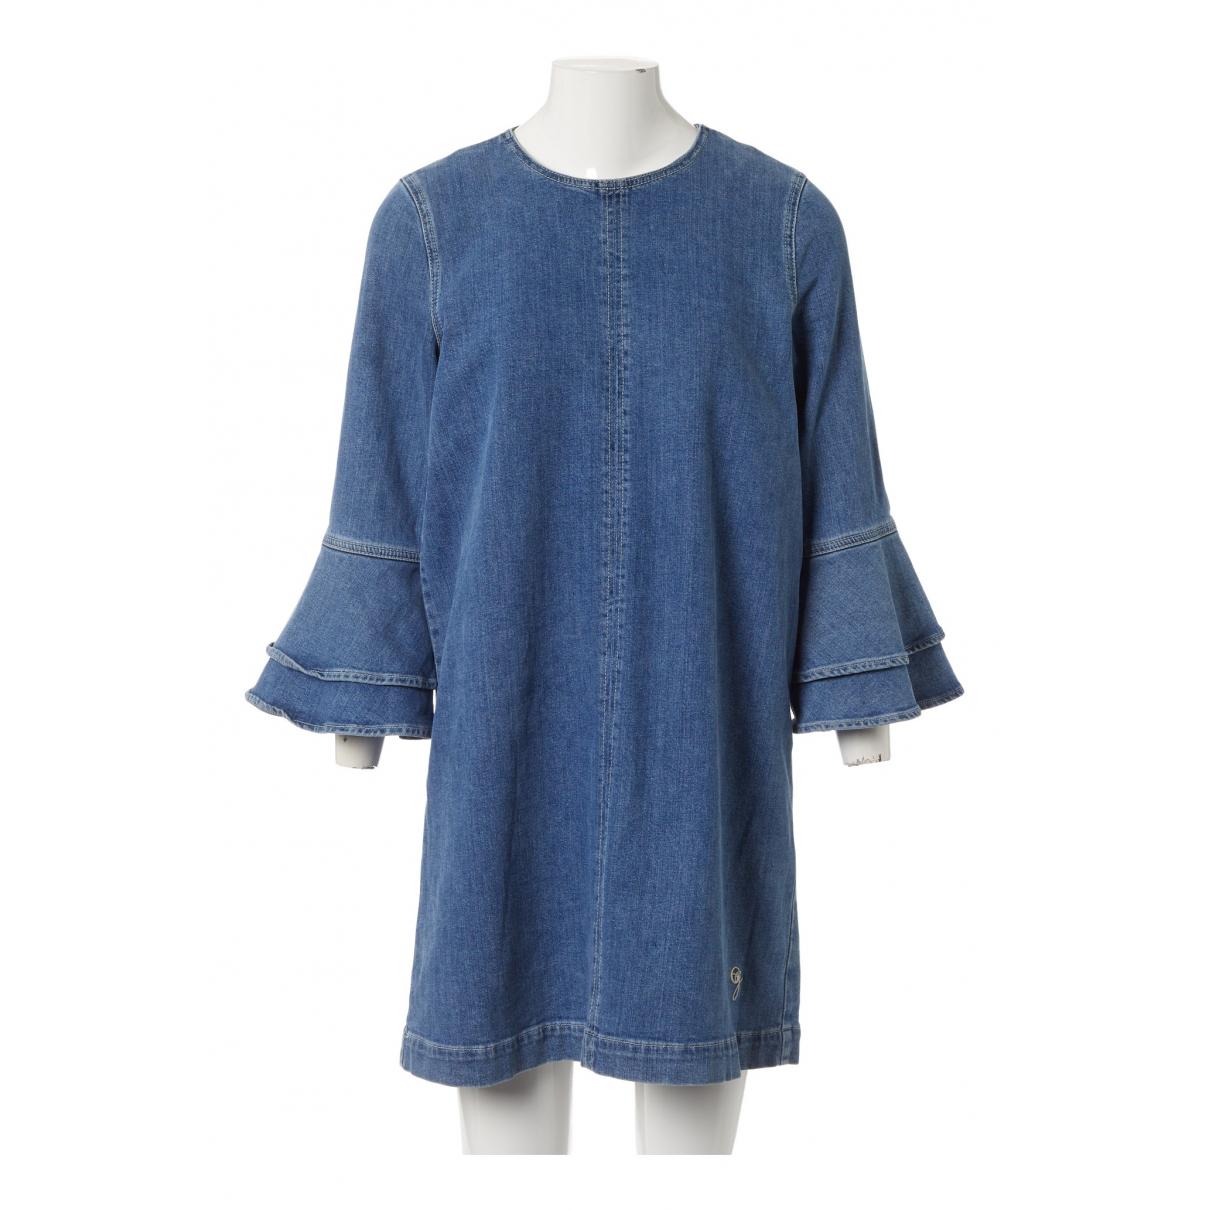 Ganni N Blue Cotton dress for Women 38 FR